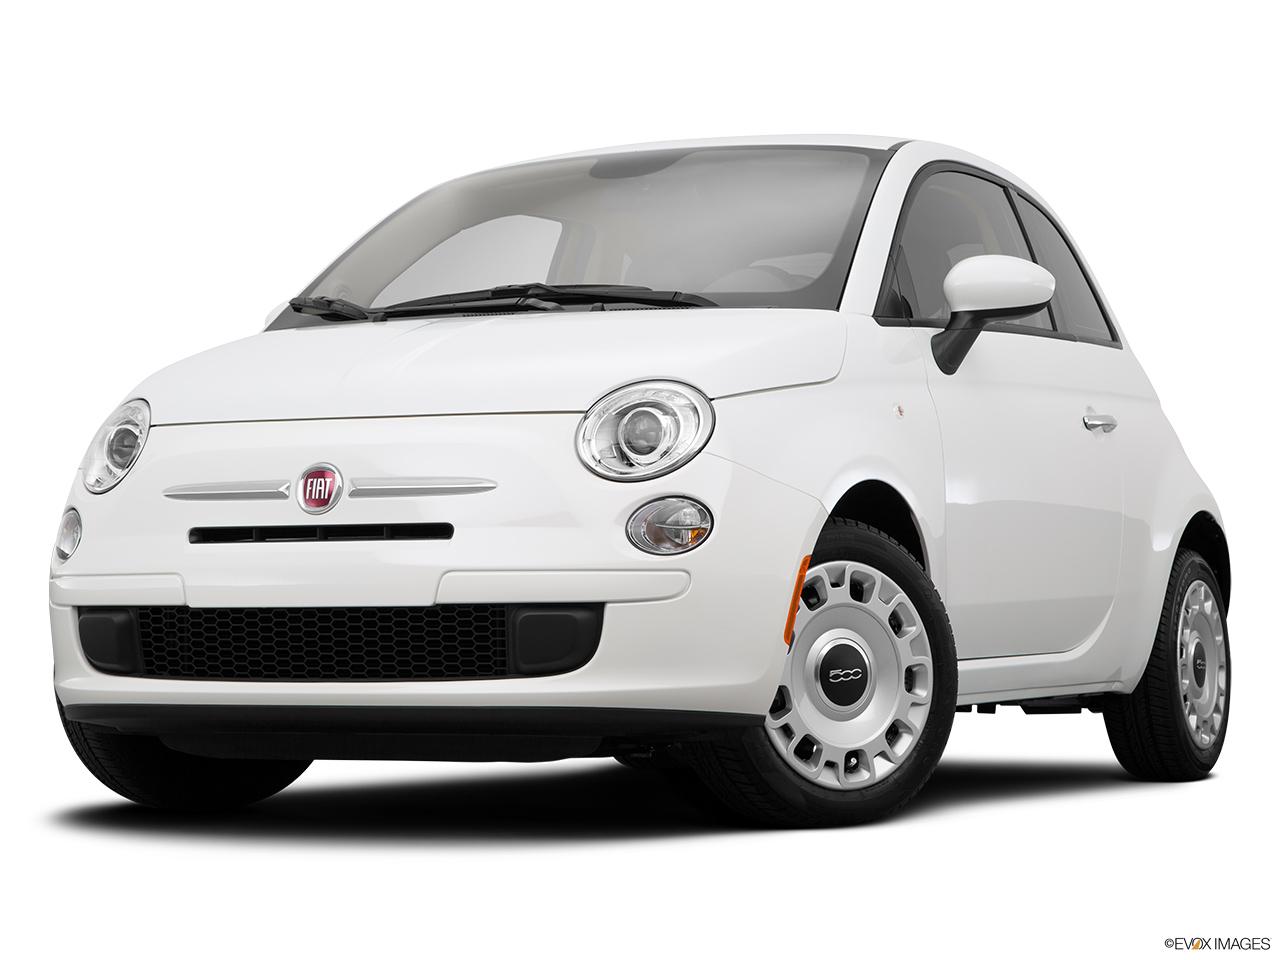 Fiat 500 Abarth >> FIAT 500 2 Door Abarth Hatchback - Photos | CarNow.com